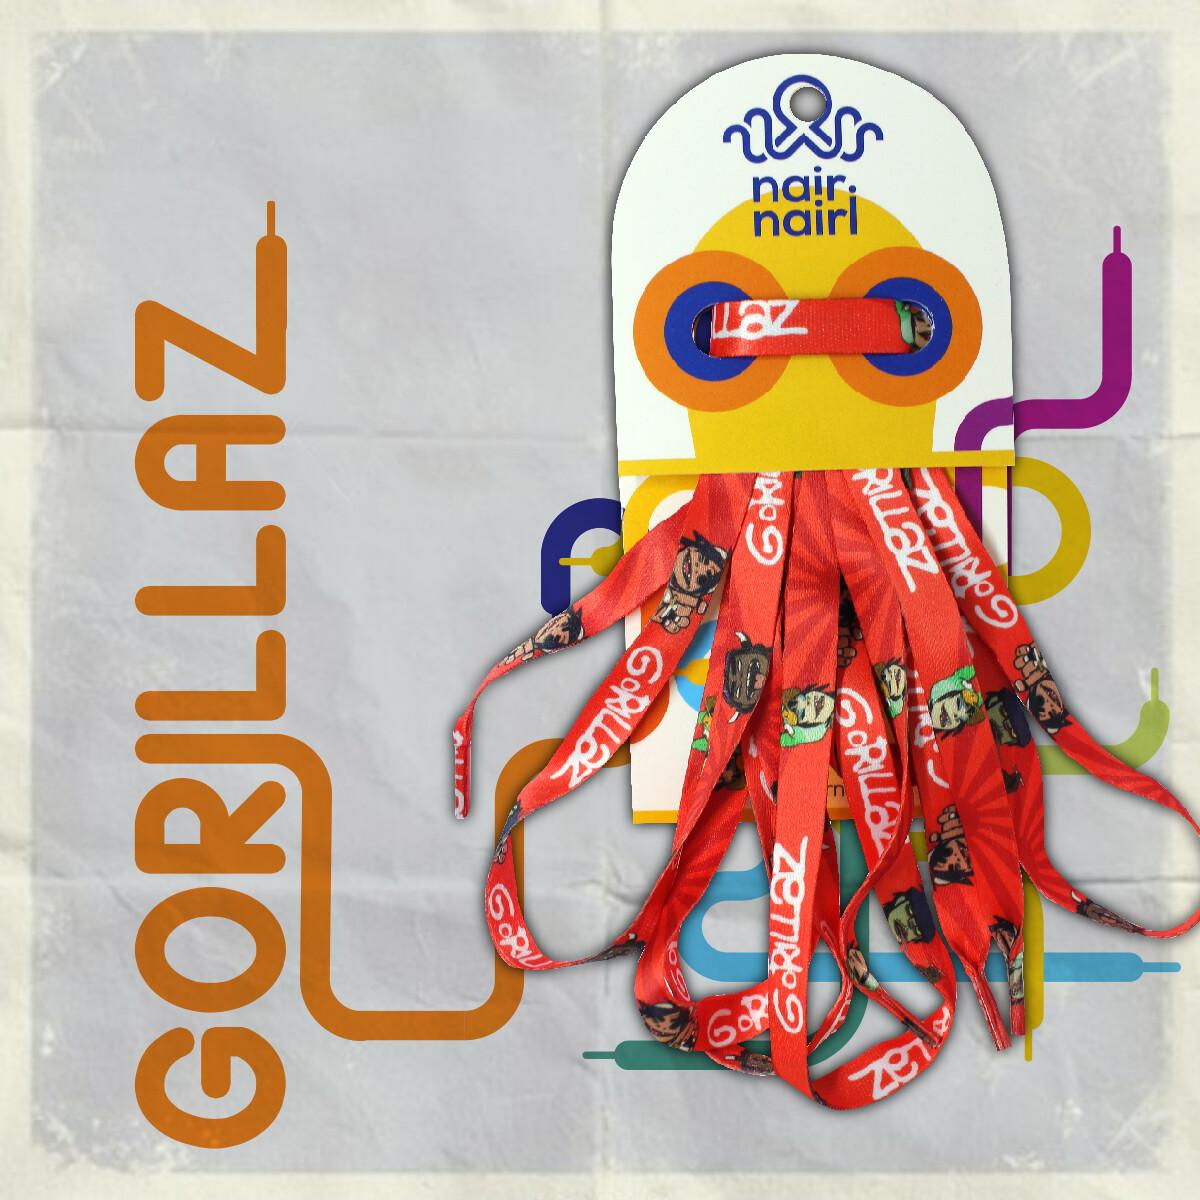 Gorillaz-ის თასმა